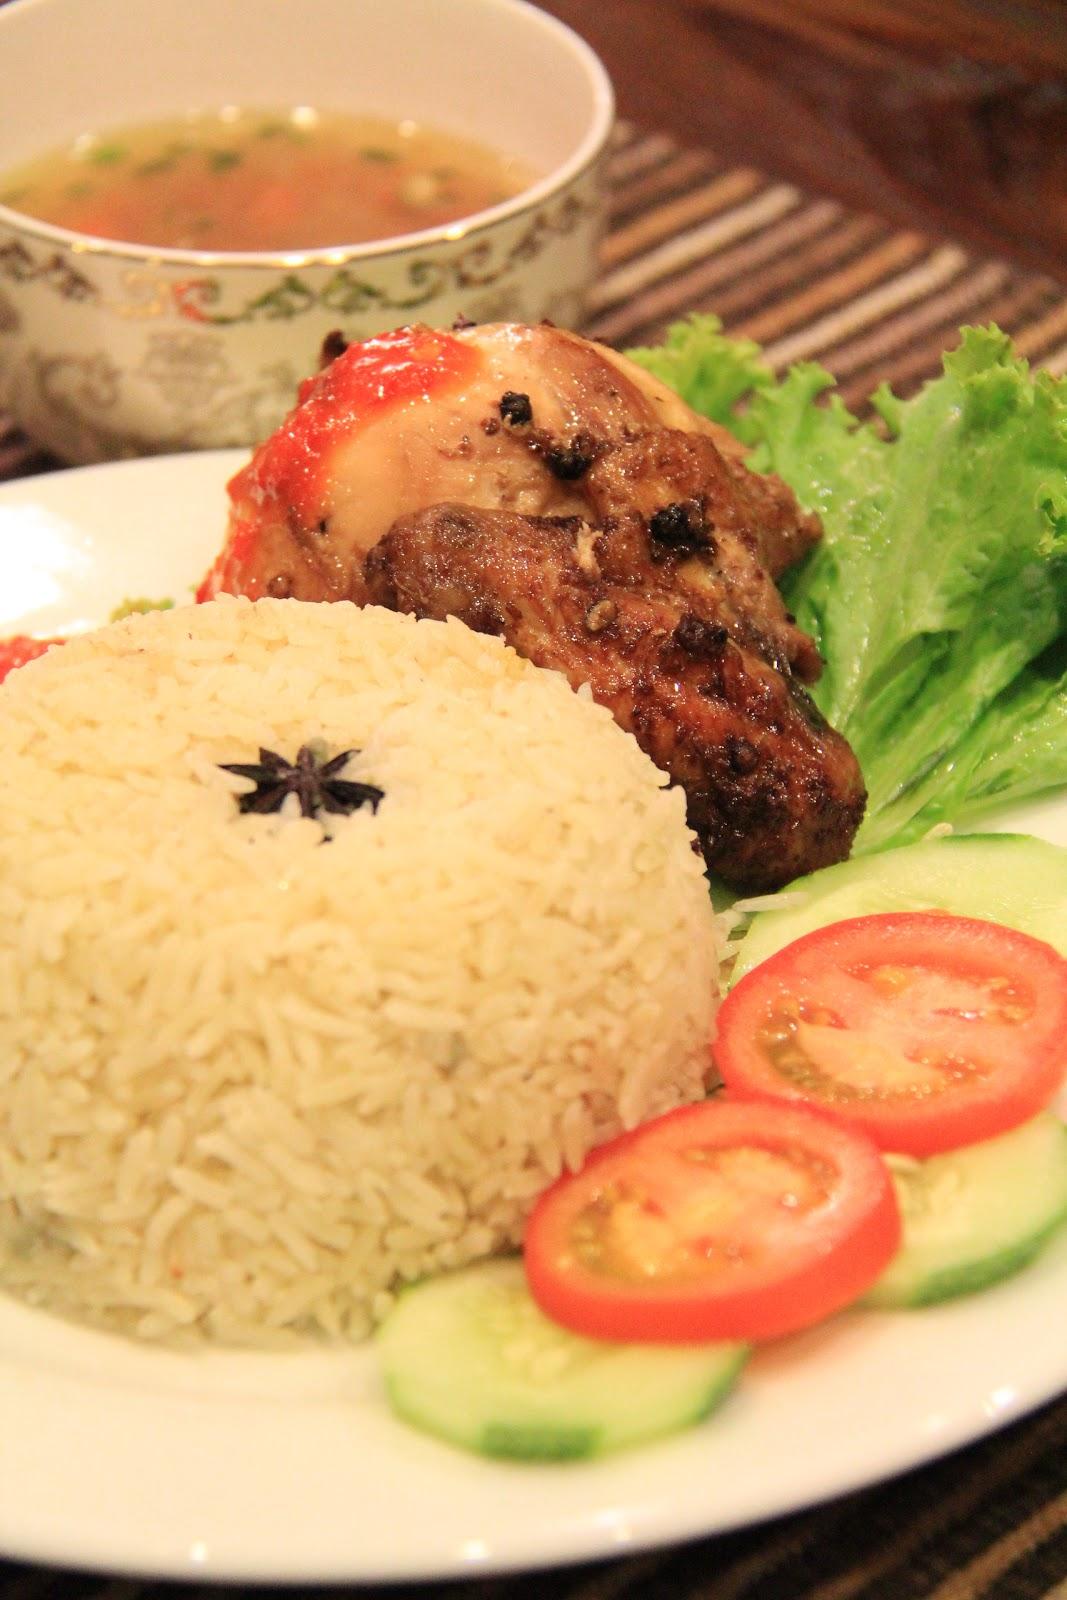 Bersama Kak Dee - Resepi Nasi Ayam ( Nasi & Ayam): NASI AYAM CHEF WAN